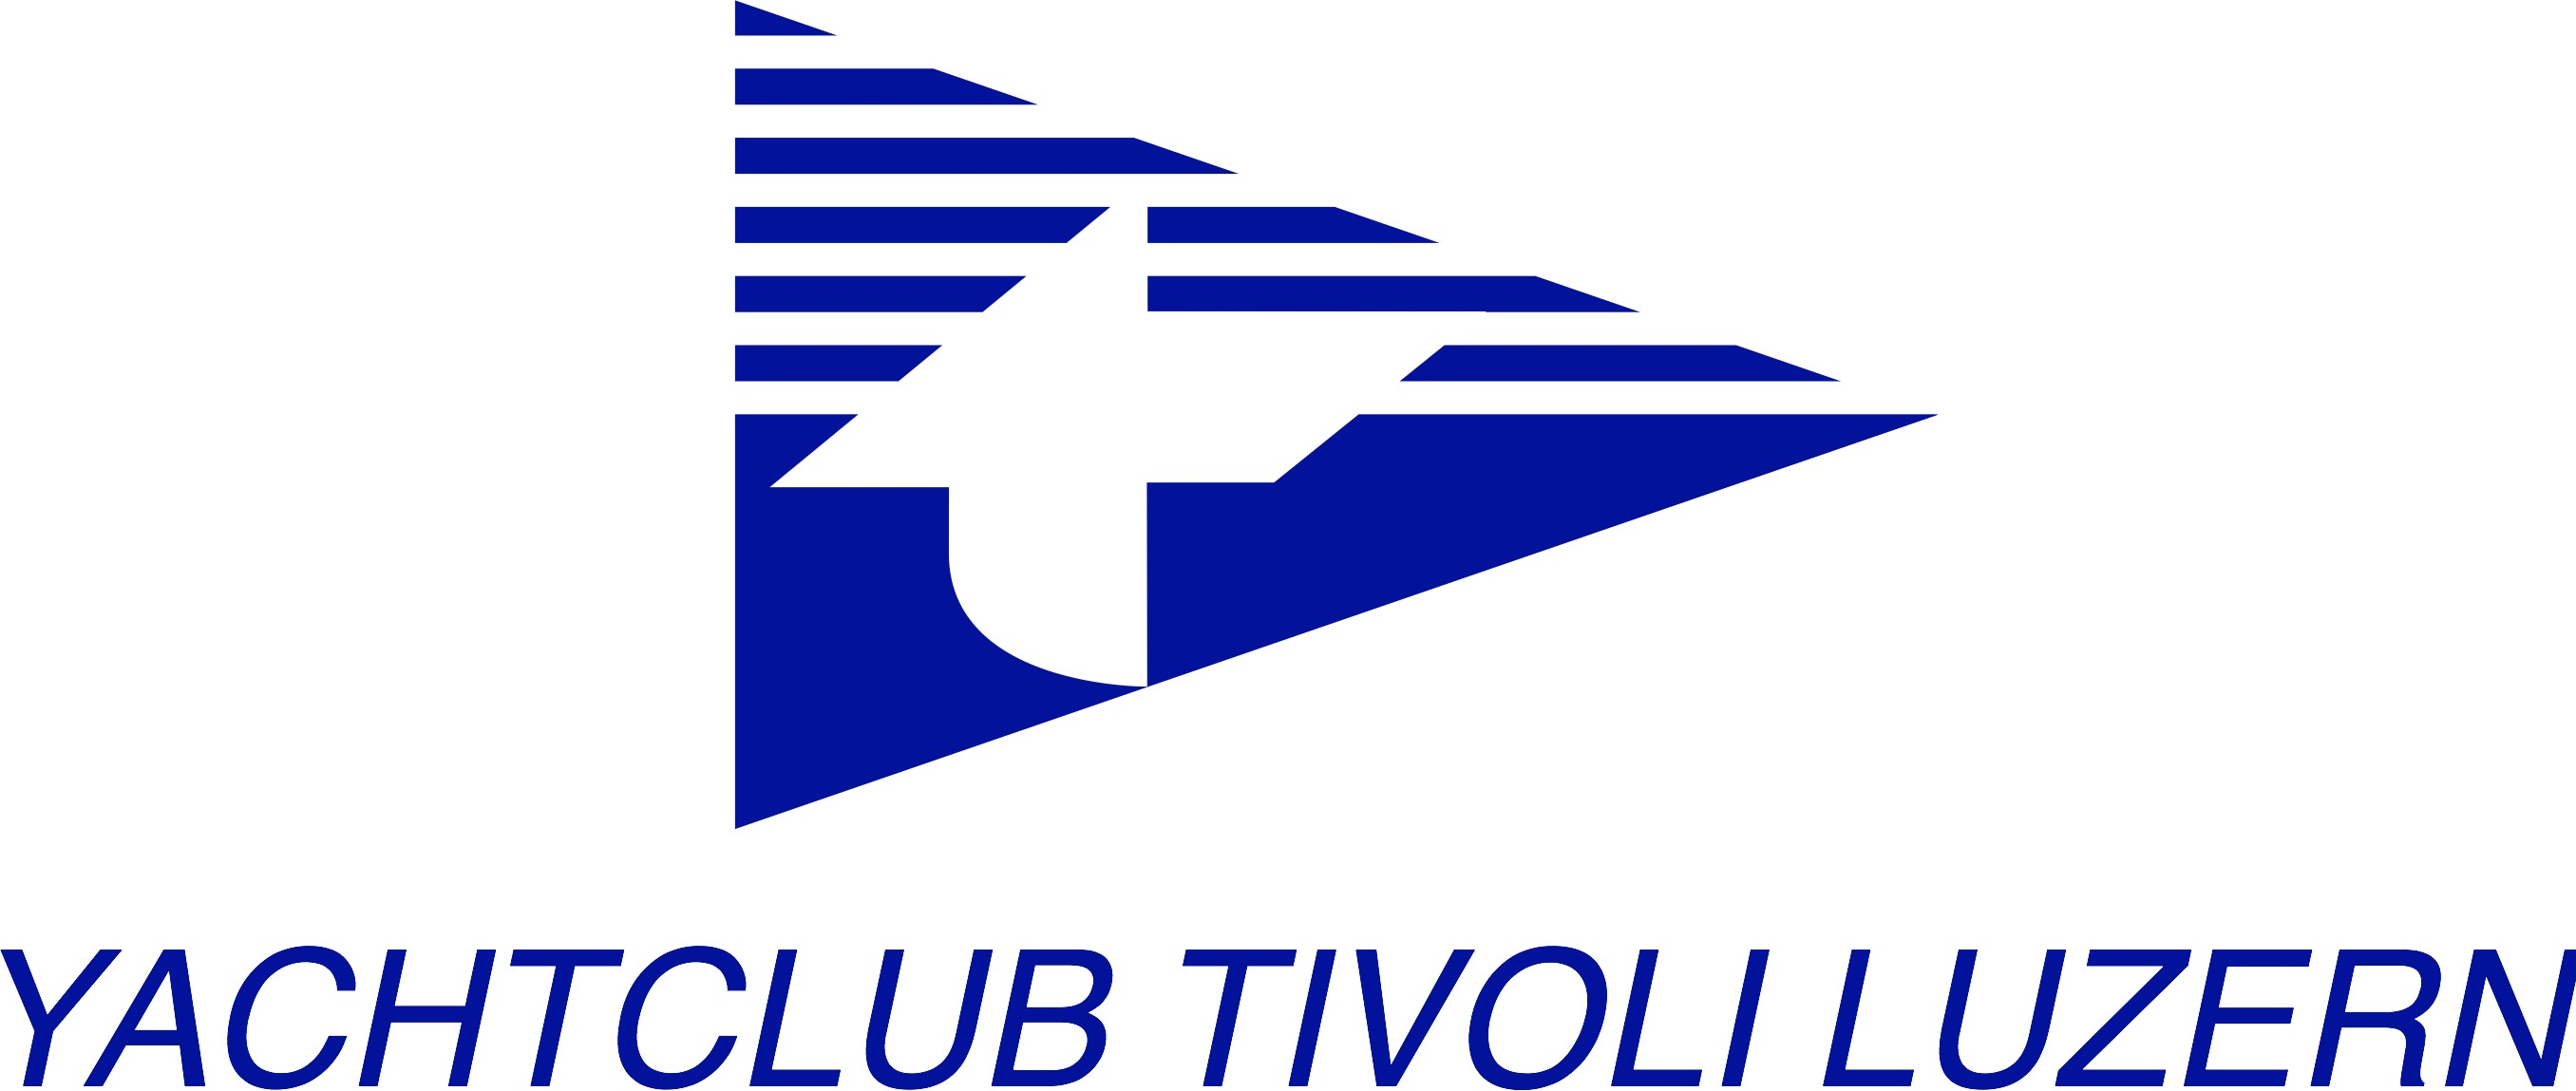 Yachtclub Tivoli Luzern